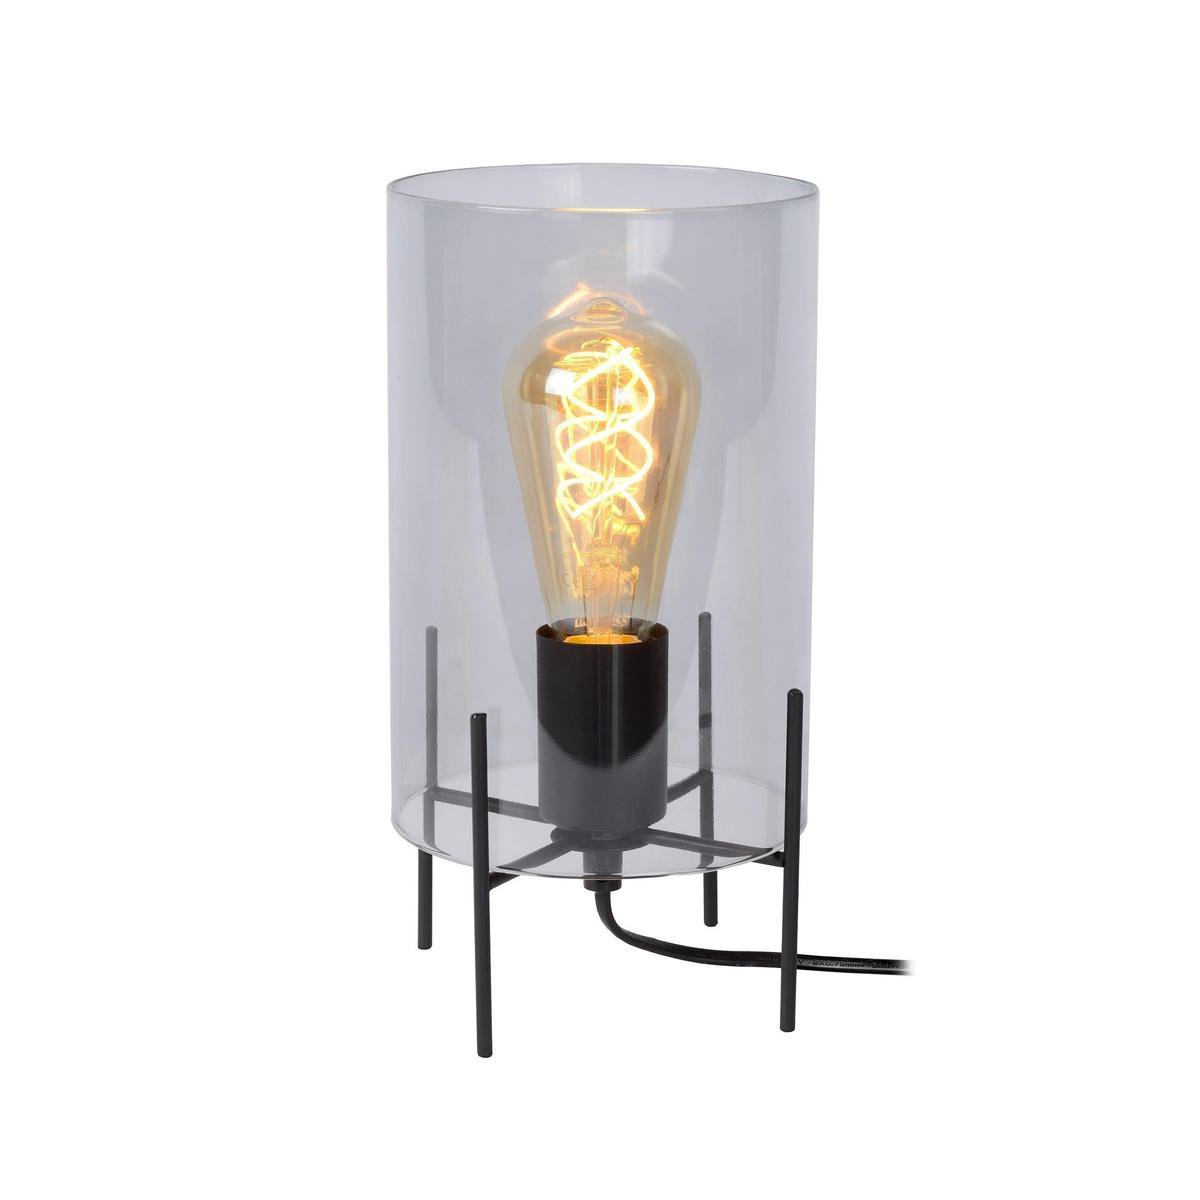 Bol Com Tafel Lamp 27cm Geschikt Voor A Lichtbronnen